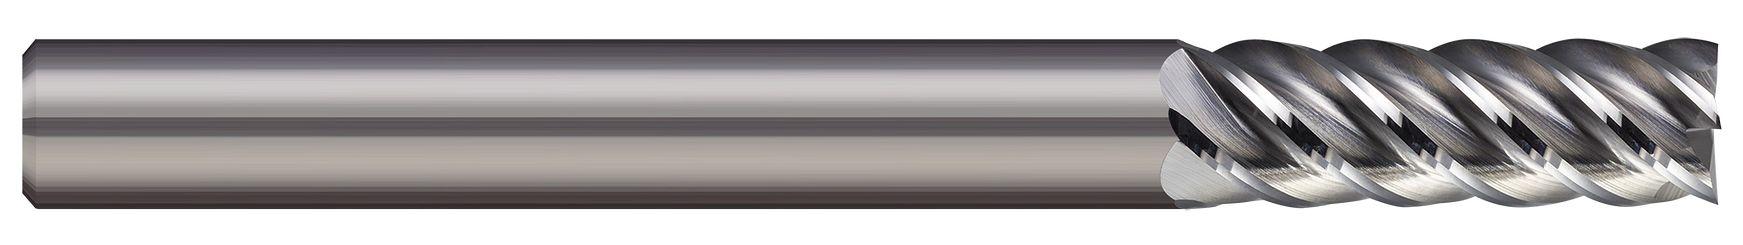 tool-details-ARMM-160-5